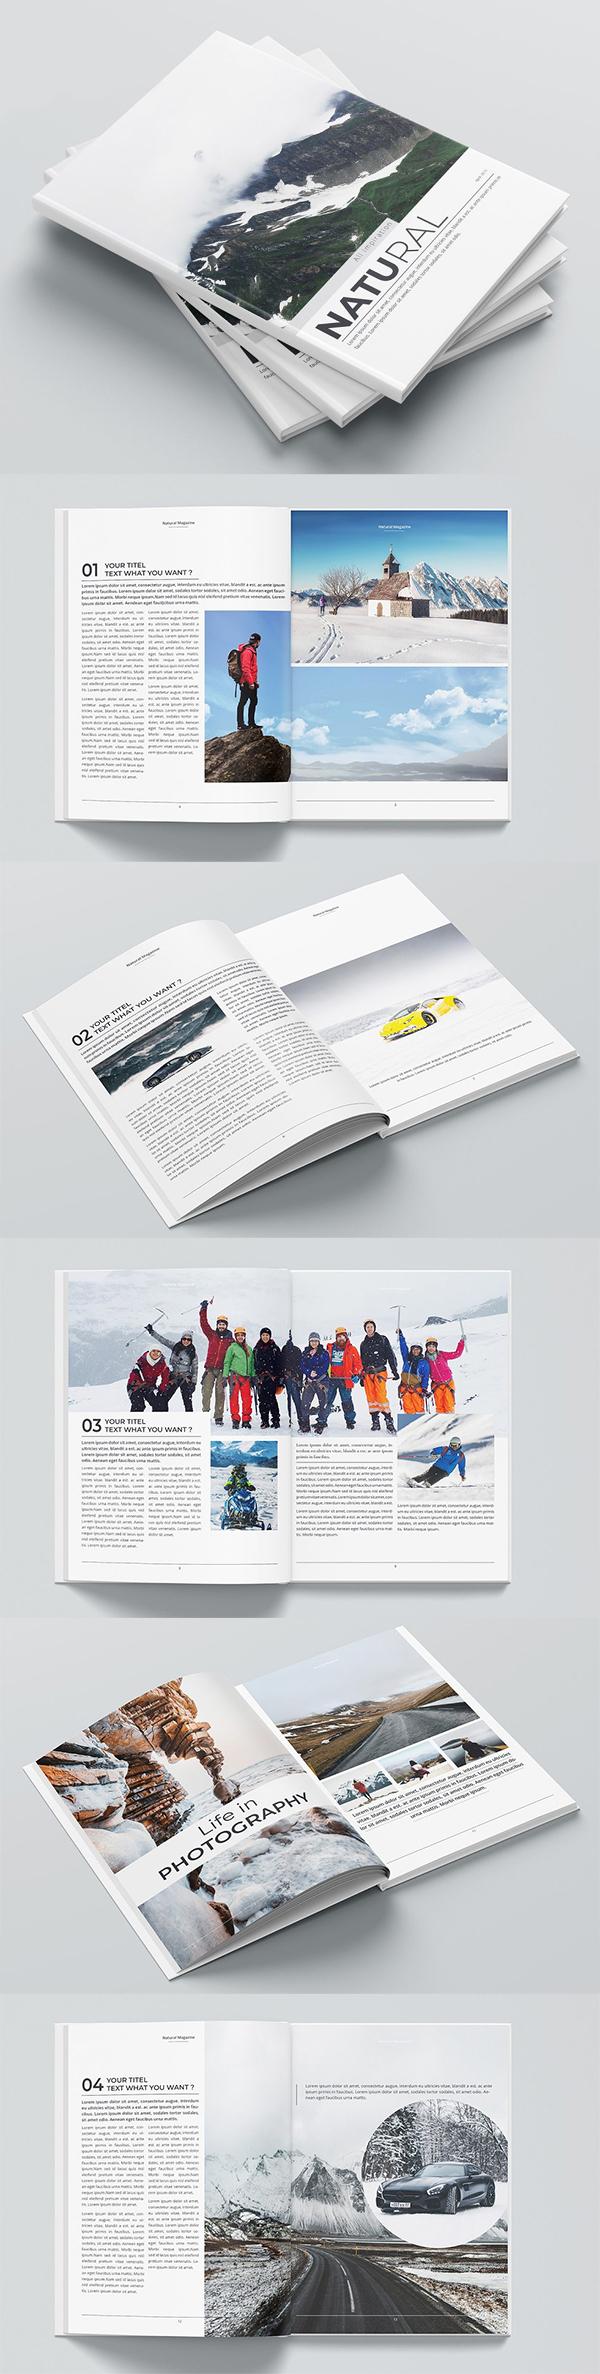 The Magazine Brochure Design